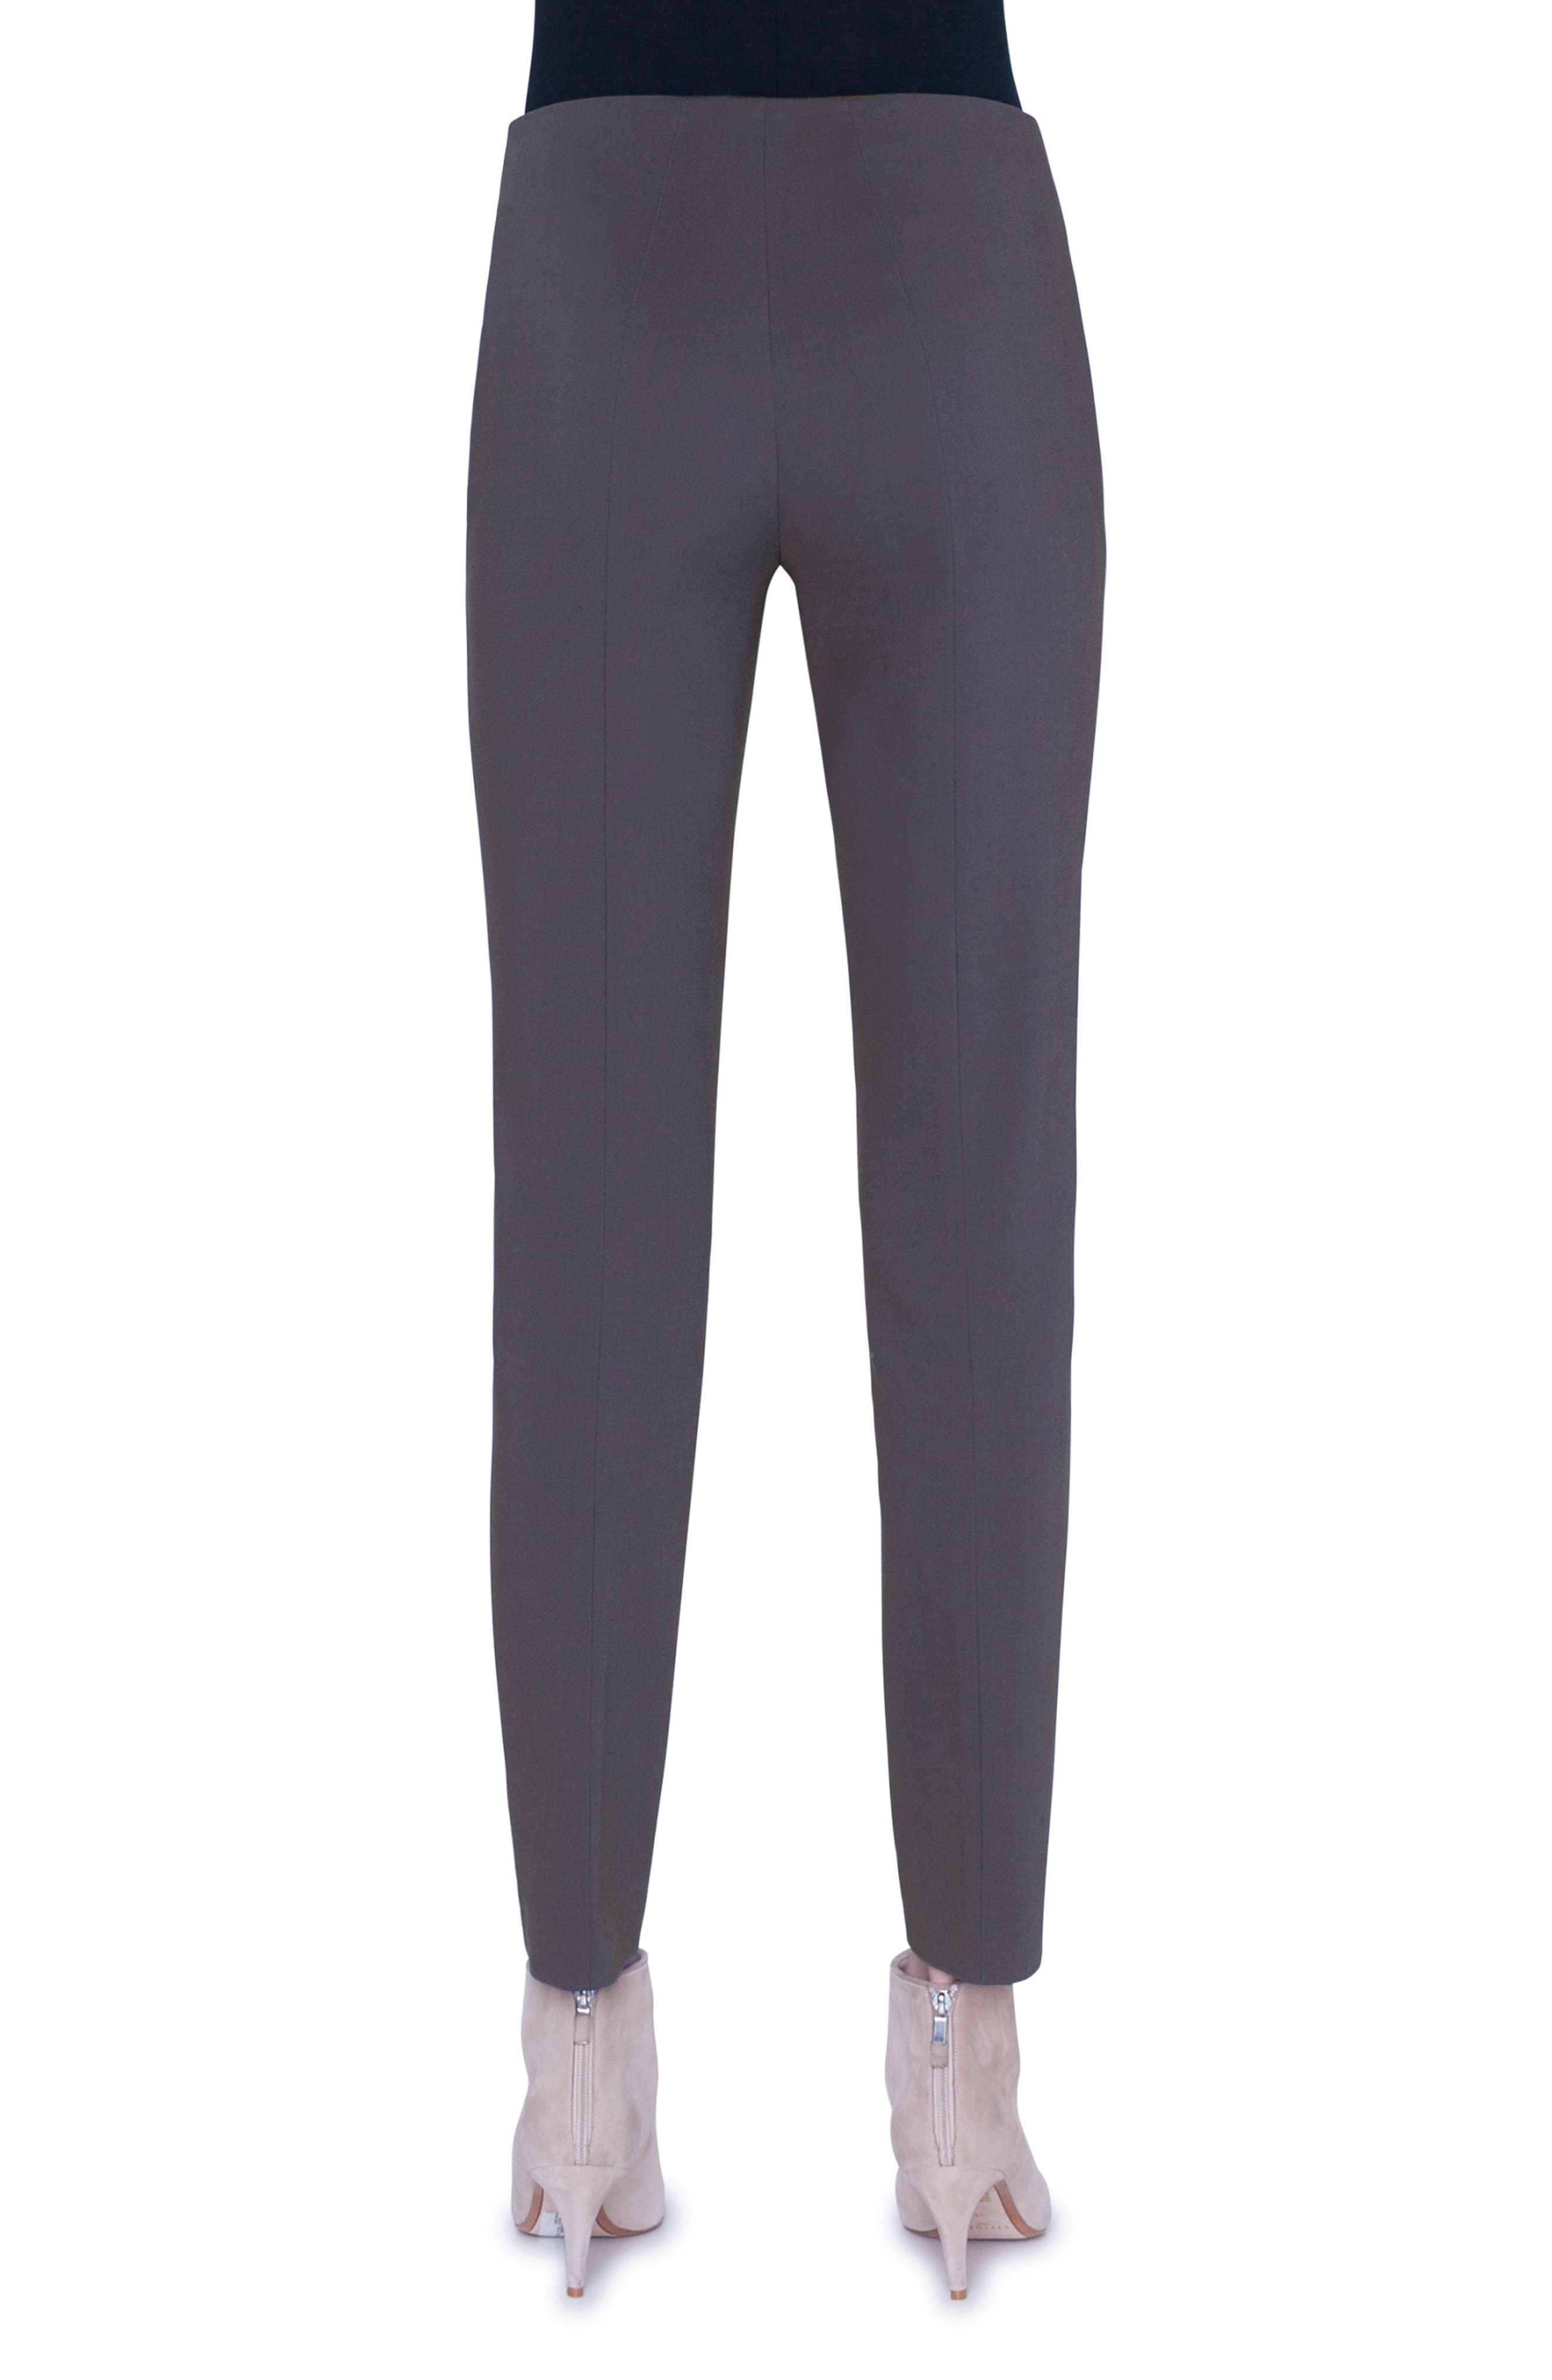 5648a3d46c7 Women's Brown Pants & Leggings   Nordstrom